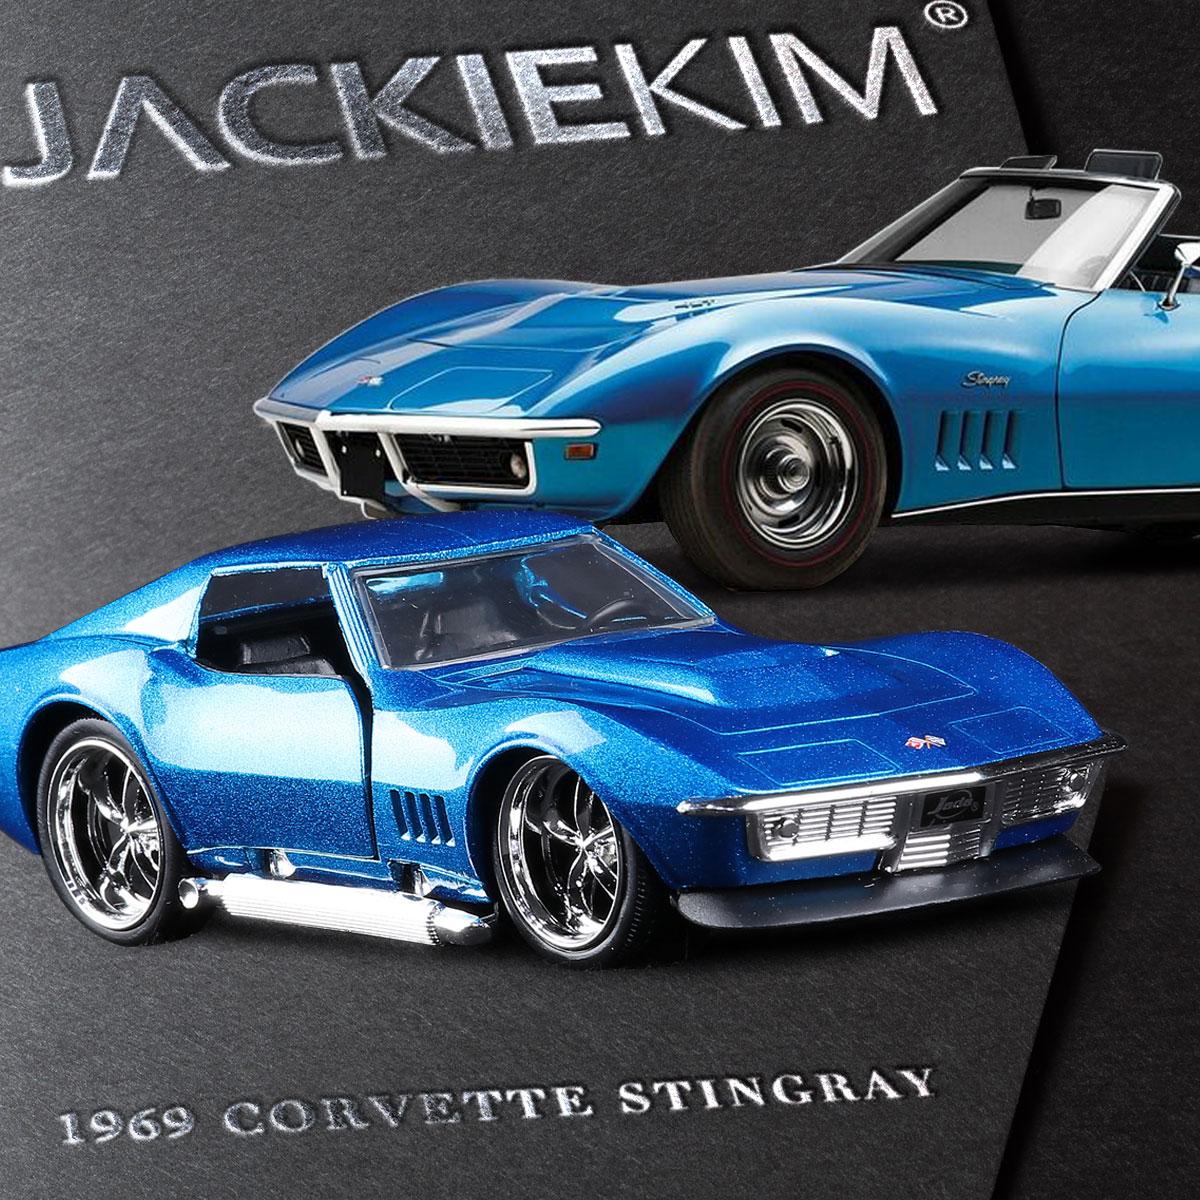 JADA 1:32 scale High simulation alloy model car,Chevrolet Corvette STINGRAY,quality toy models,free shipping(China (Mainland))